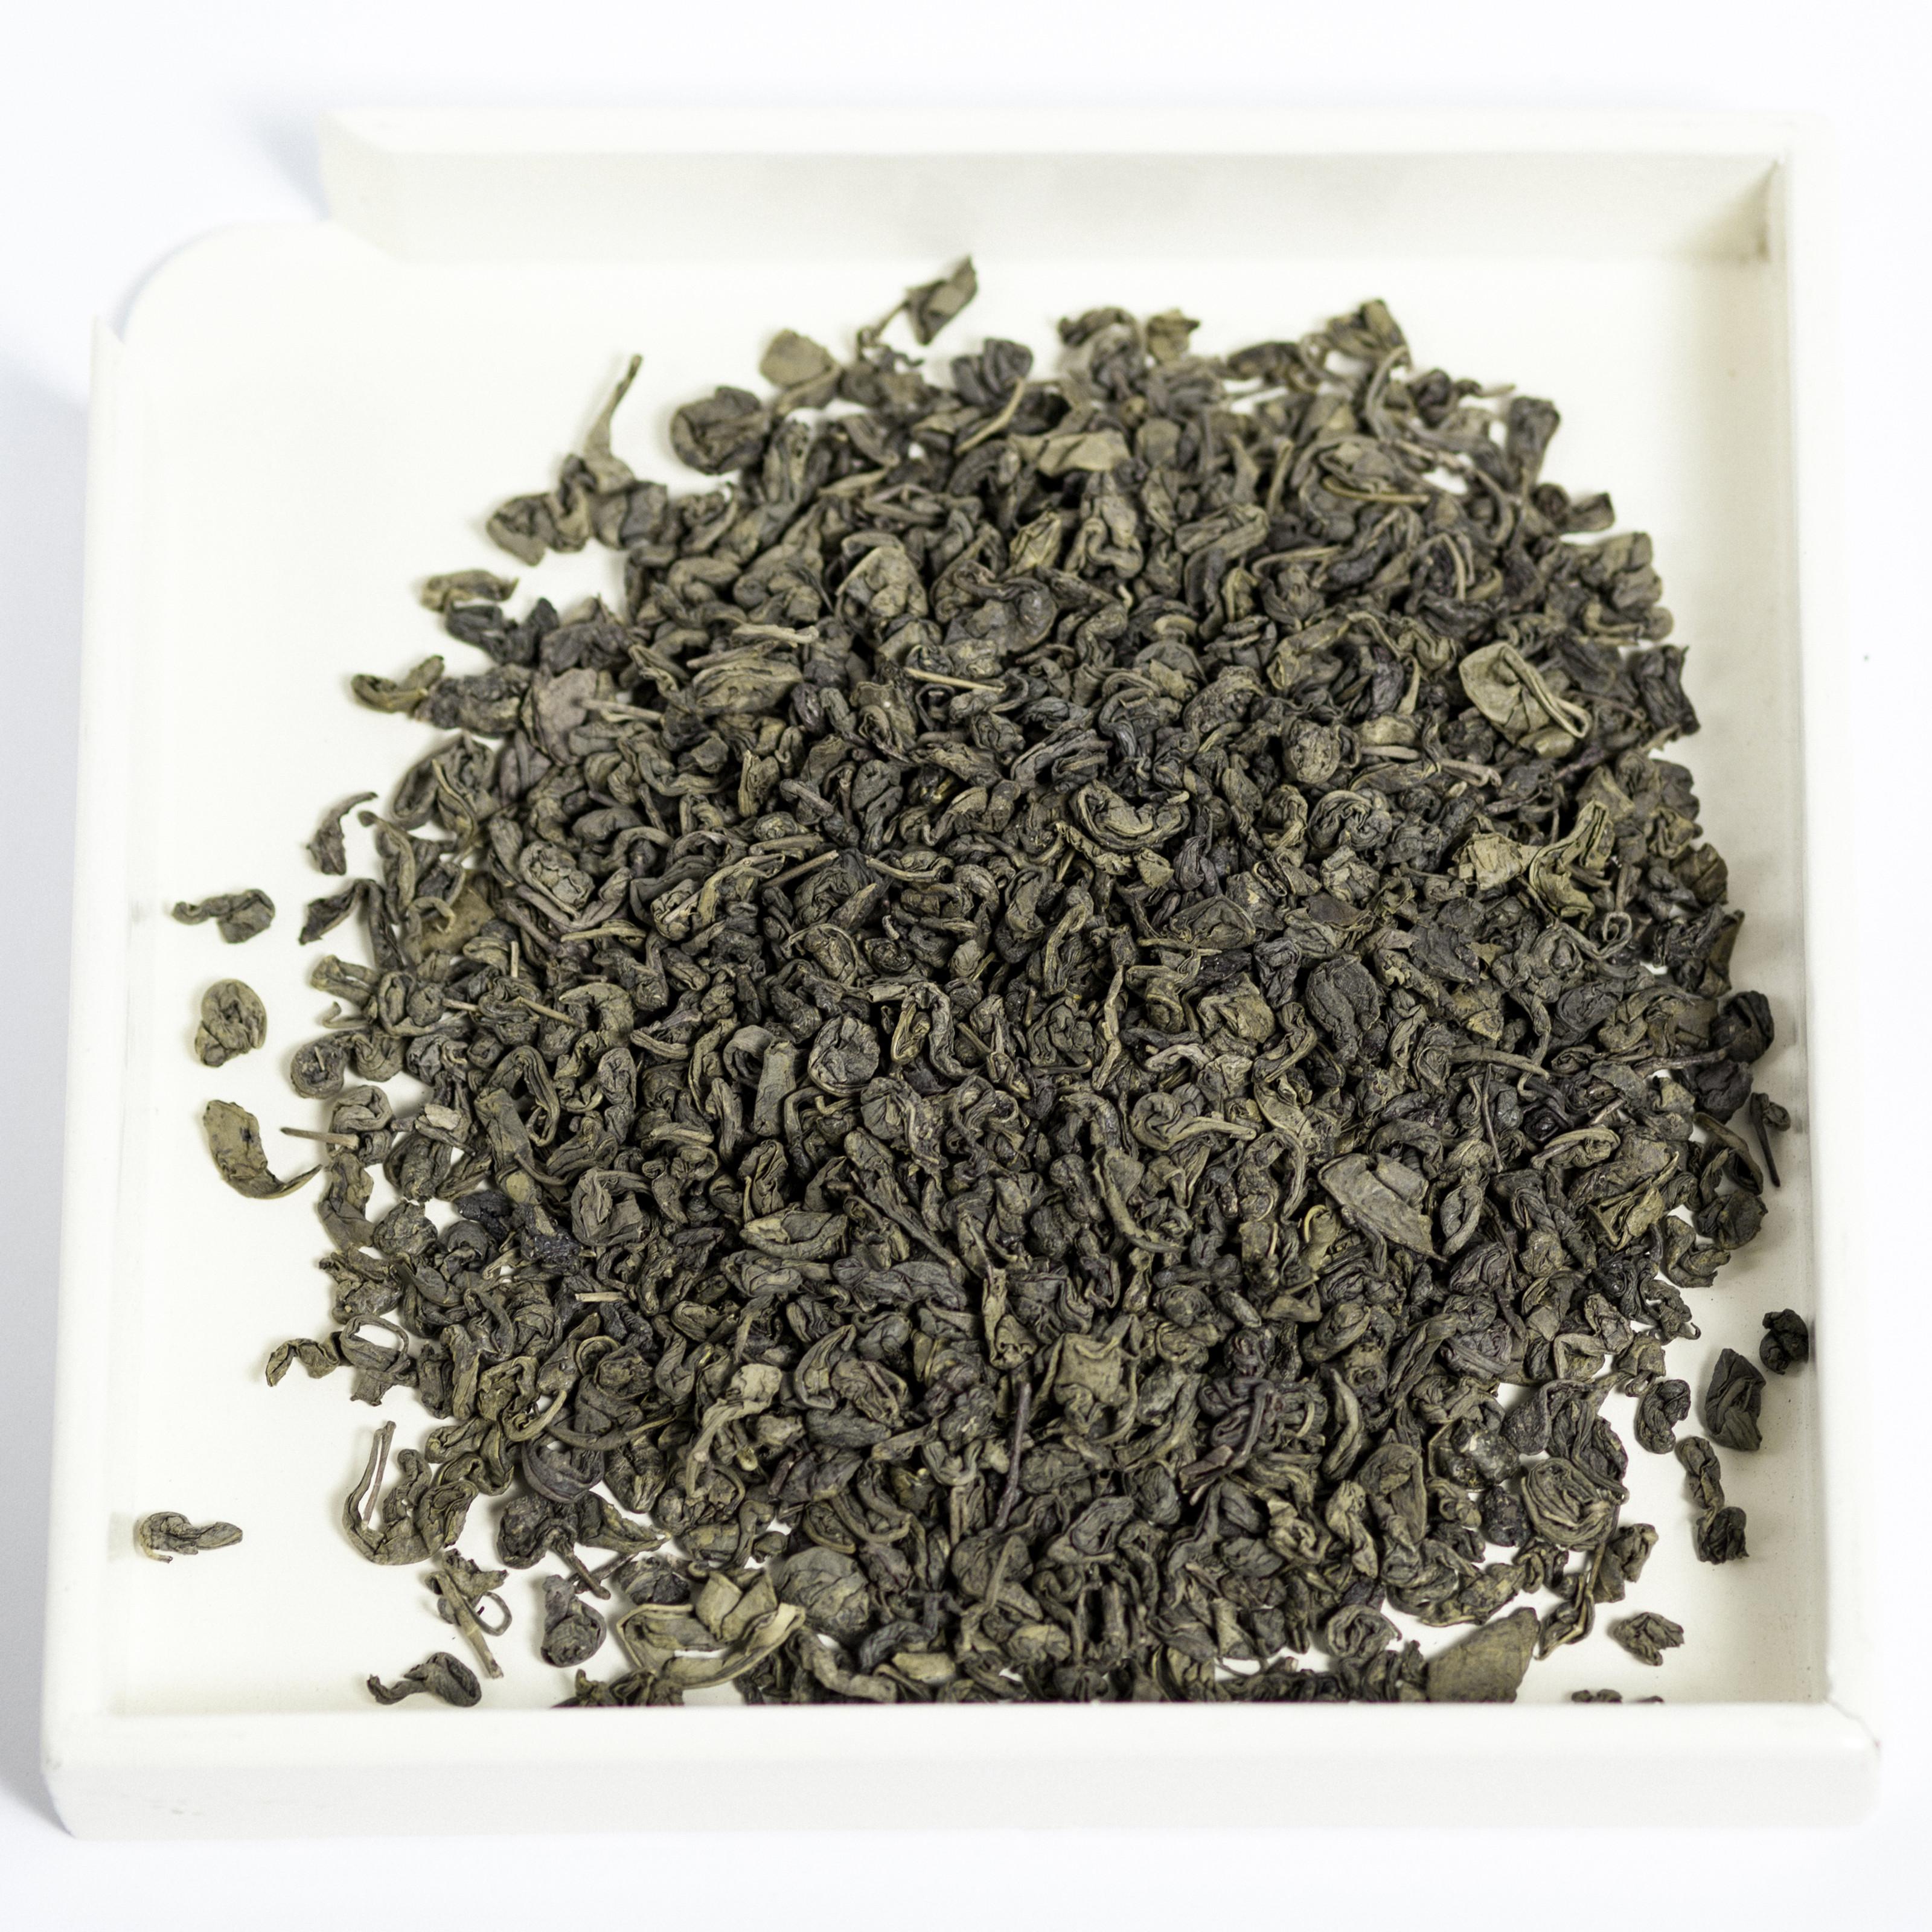 wholesale tea factory China green tea 9501 for Uzbekistan market - 4uTea   4uTea.com